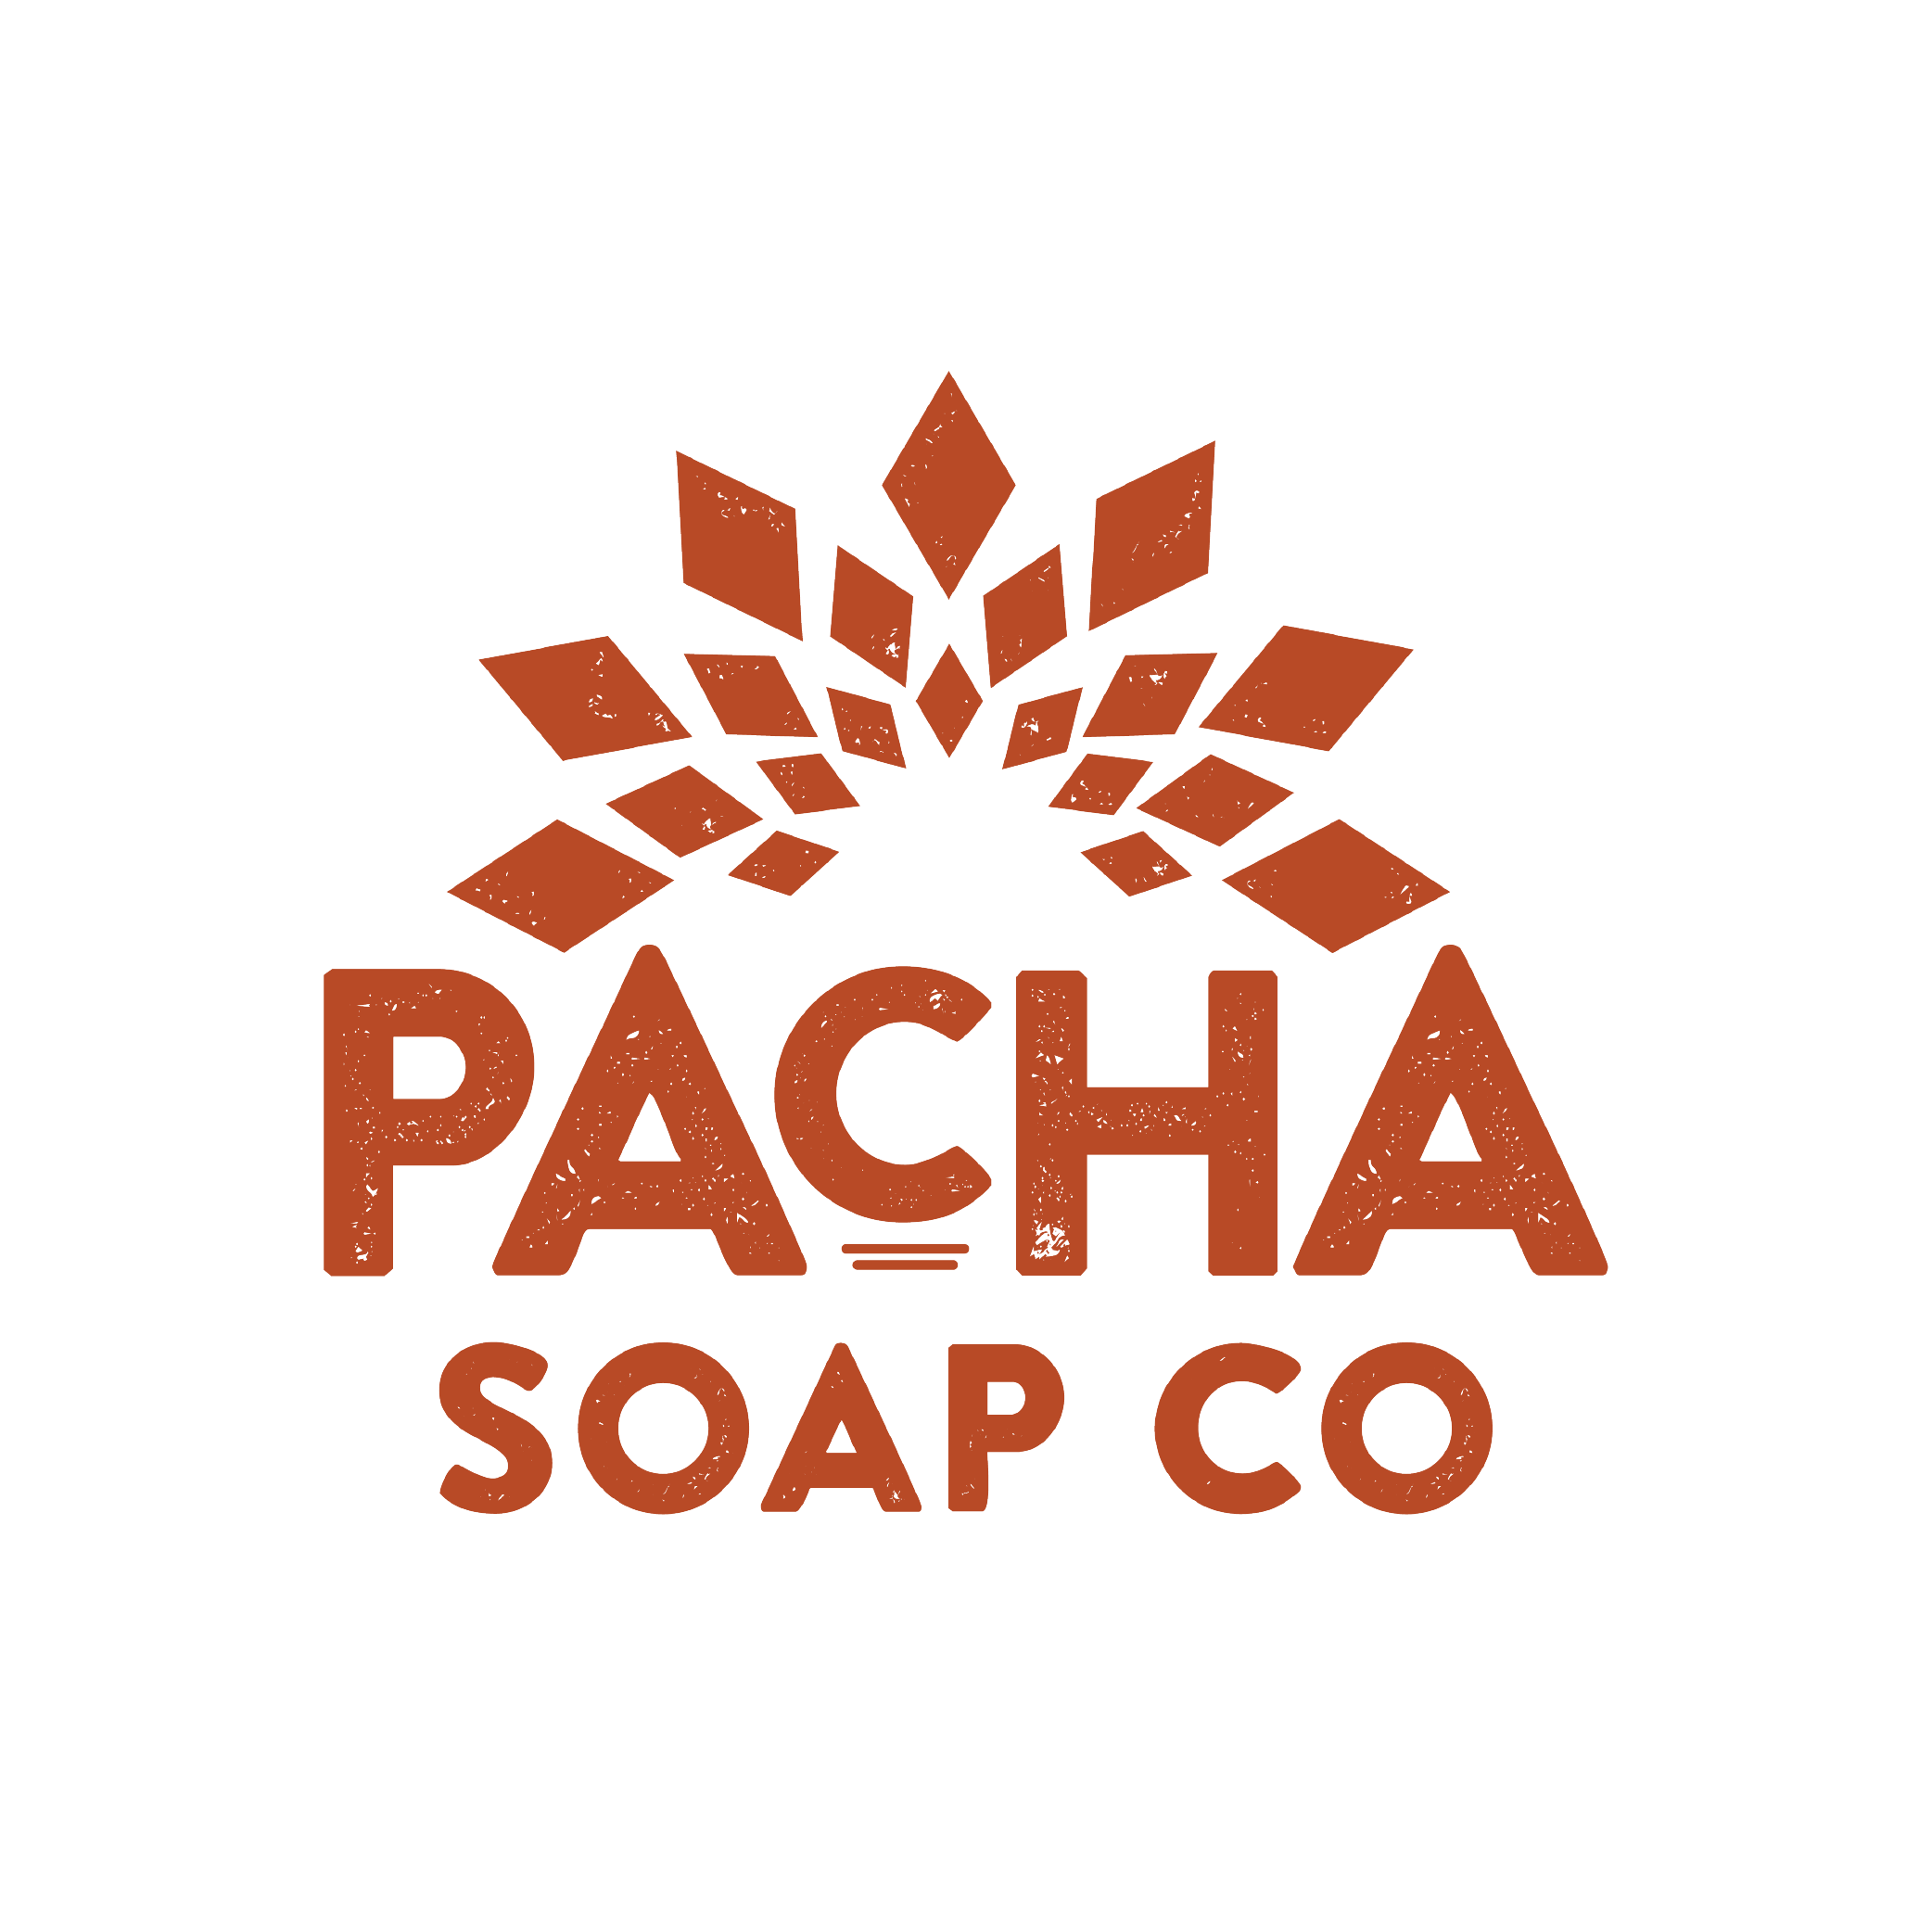 Copy of Pacha Soap